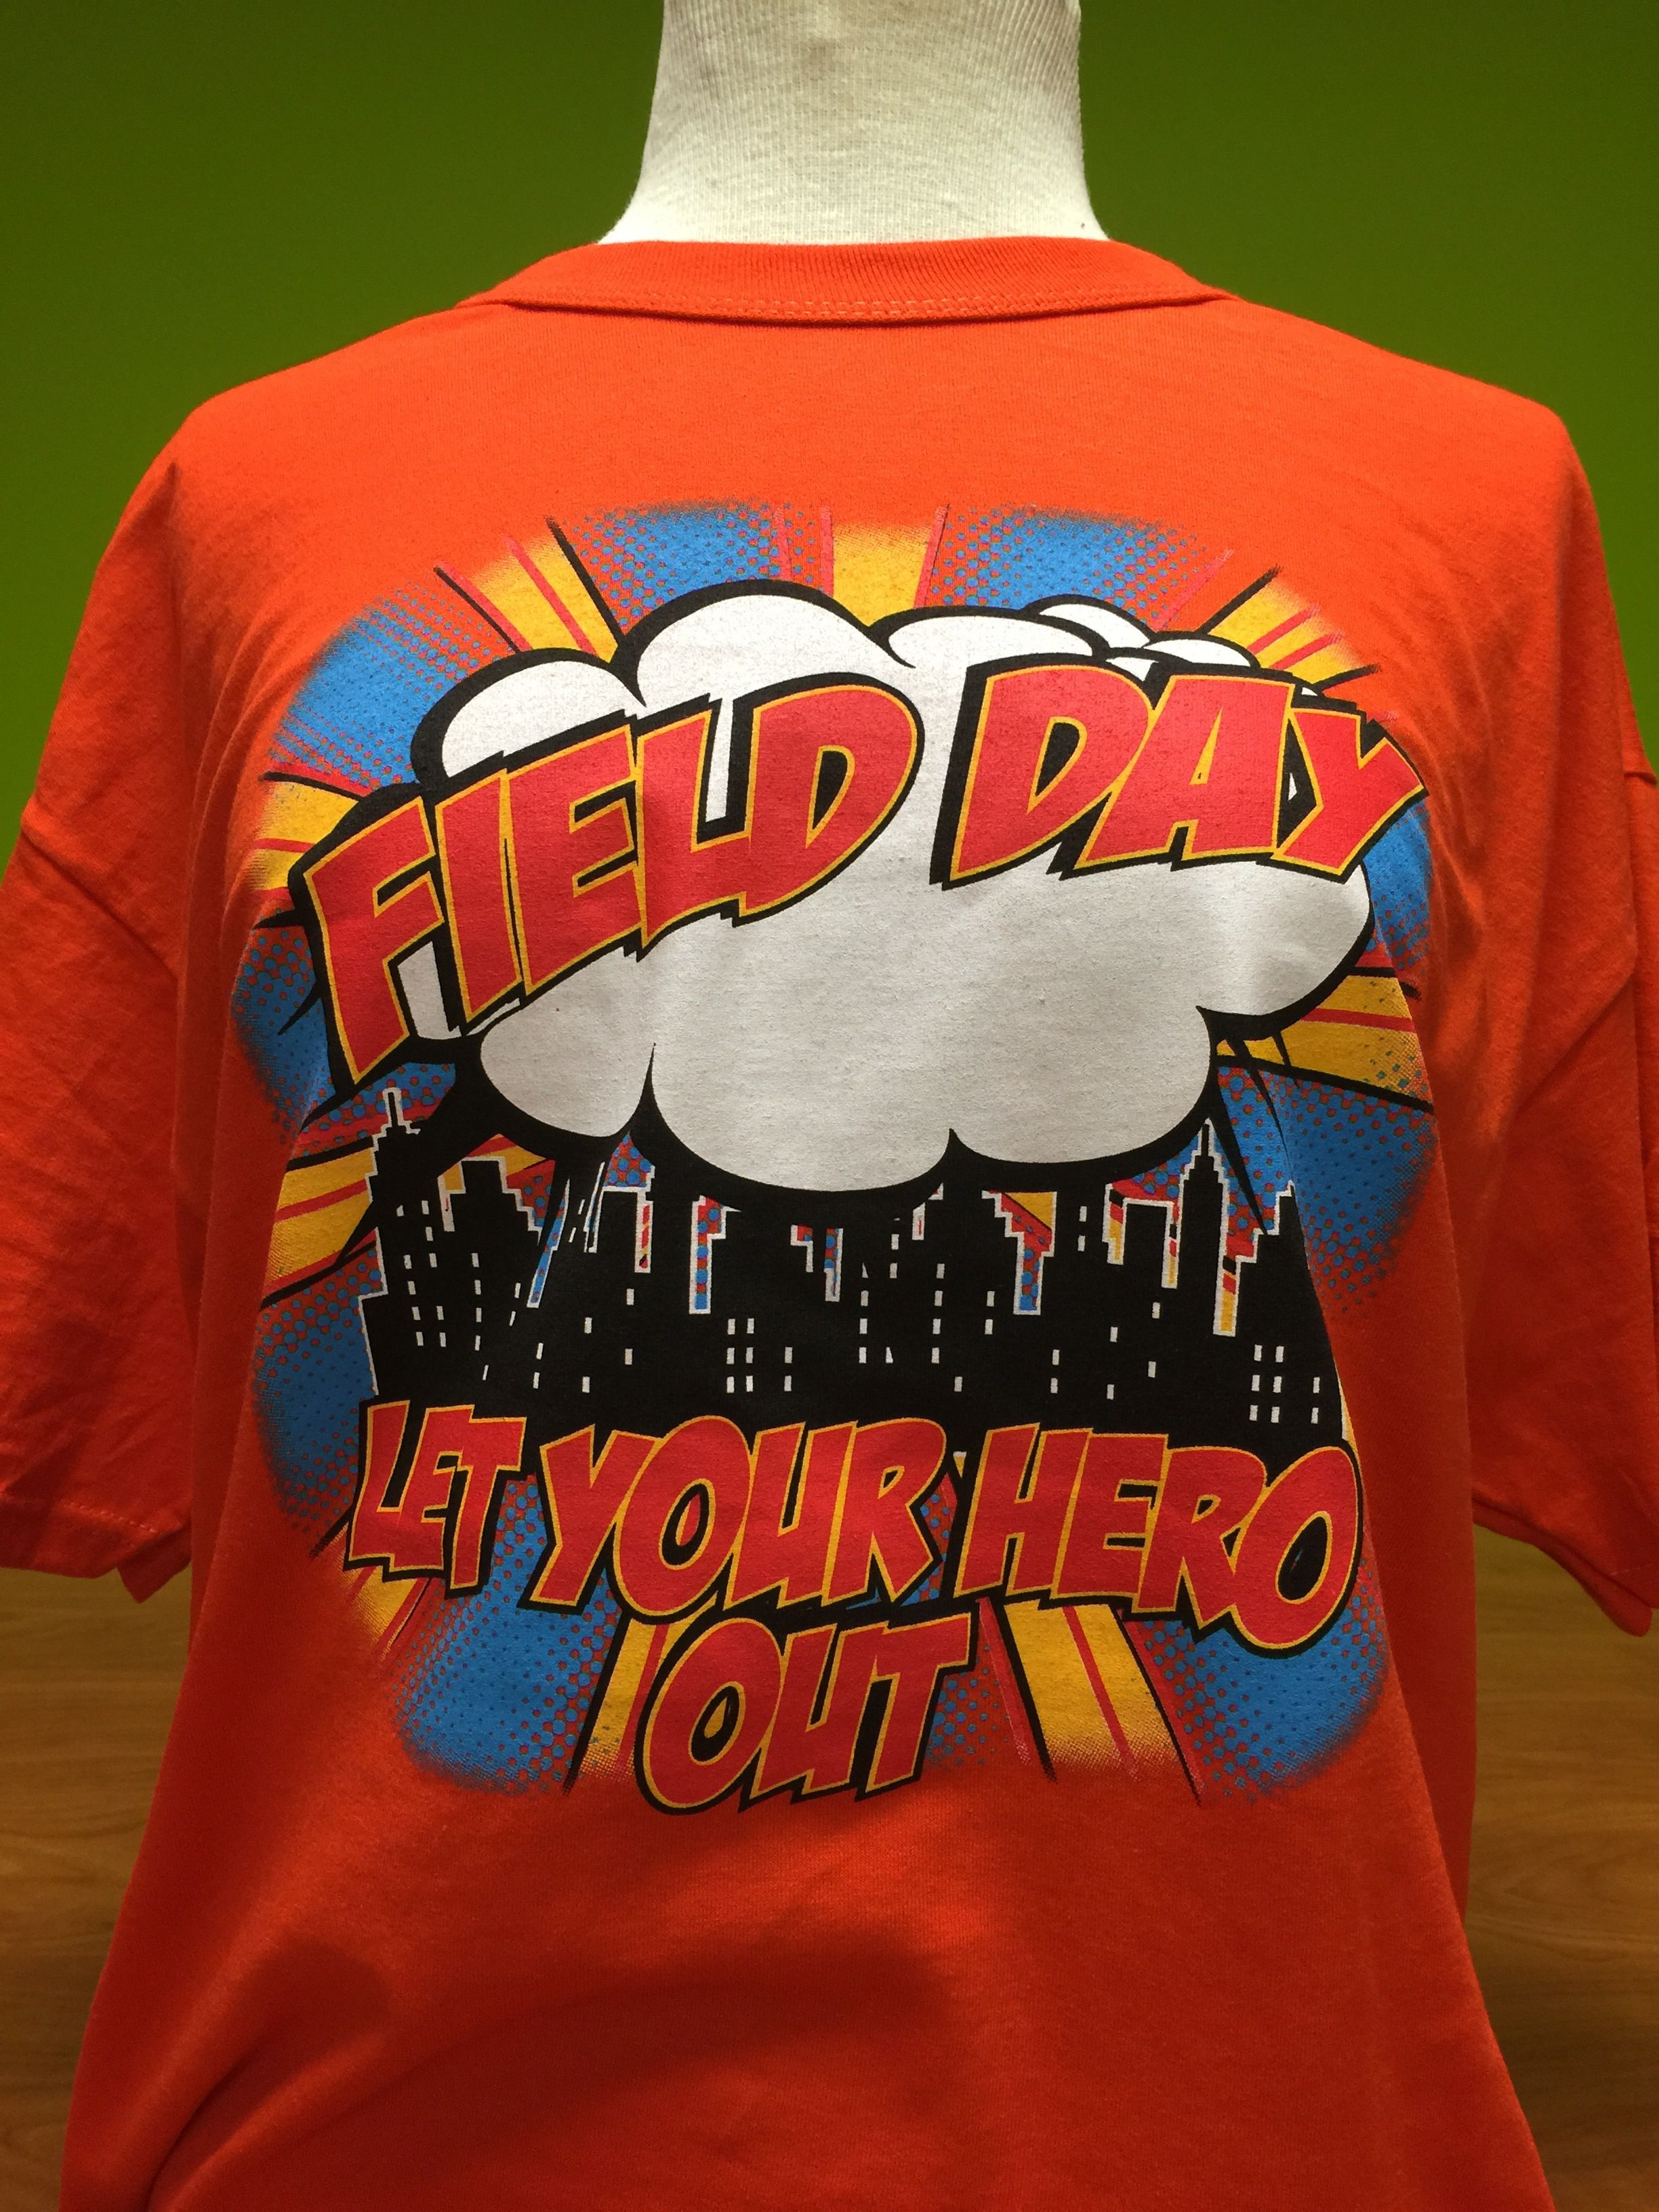 9a696dd09 Fielddayusa.com Super Hero Themed Field Day! | Field Day T-Shirts ...